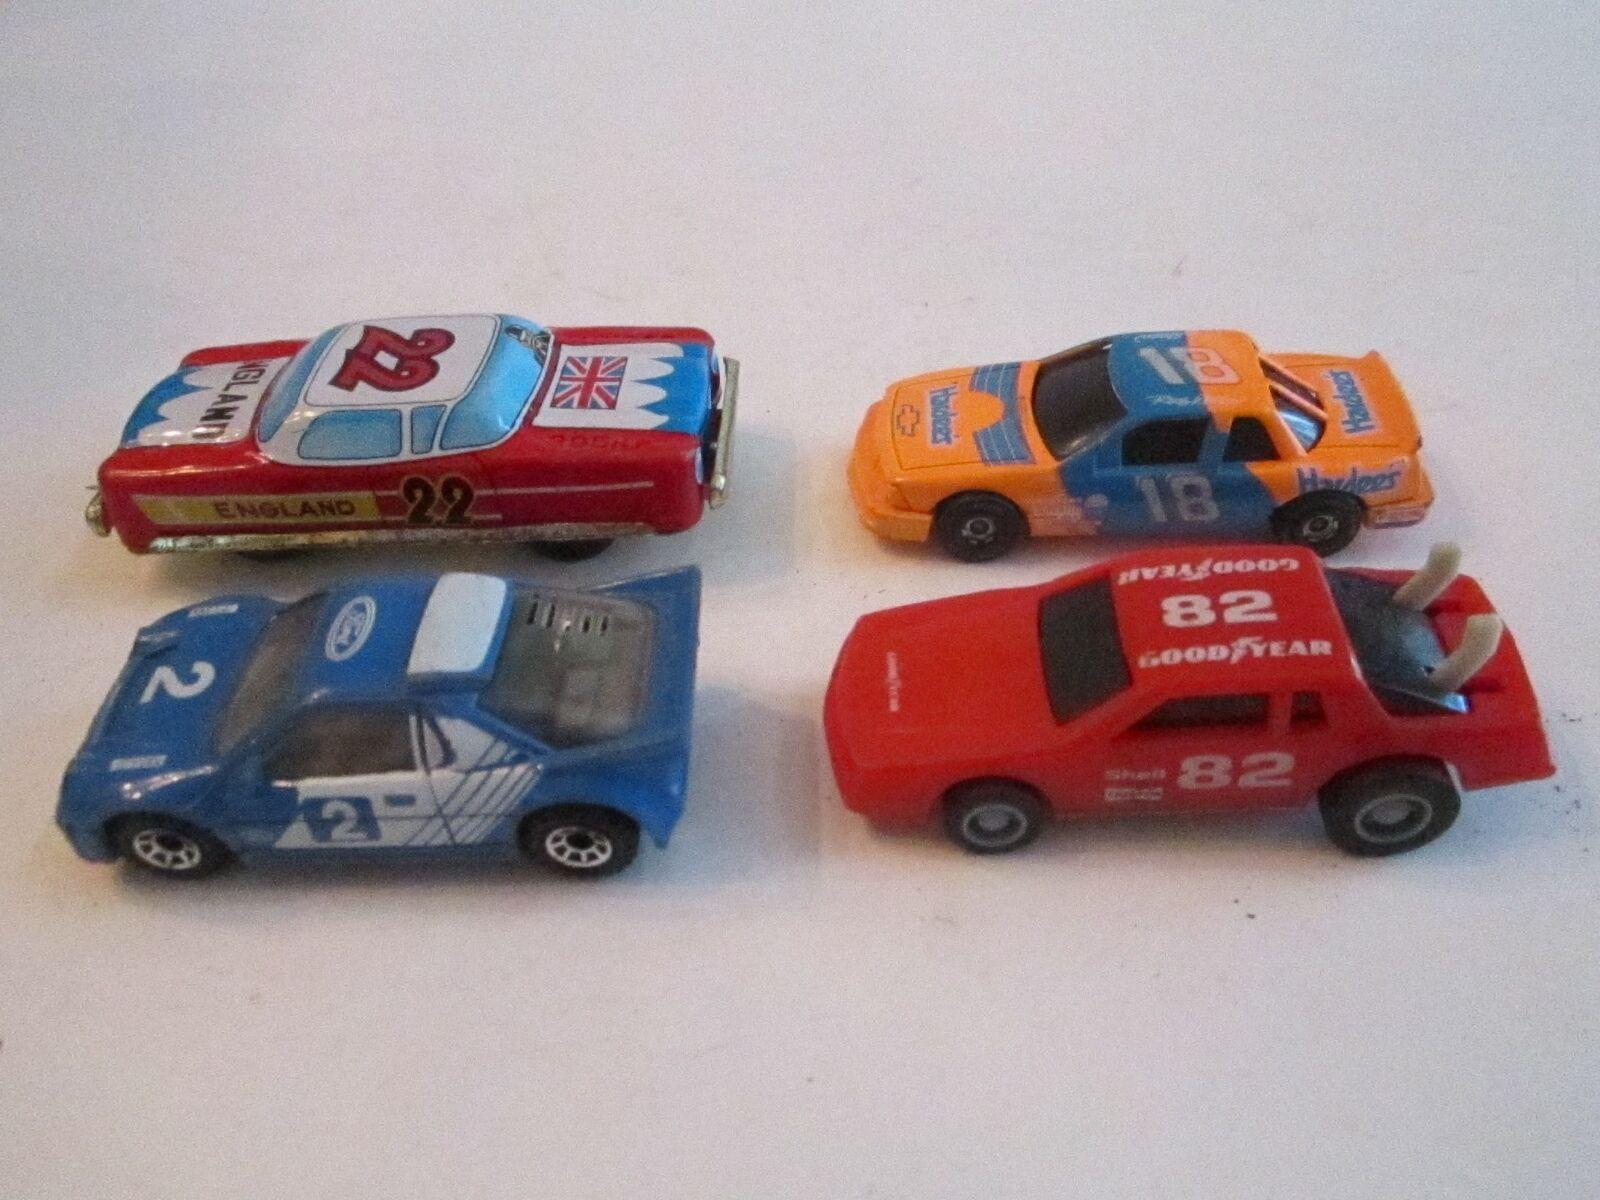 4 VINTAGE TOY RACING CARS, MATTEL, RACING CHAMPIONS, '86 MATCHBOX - MB 1